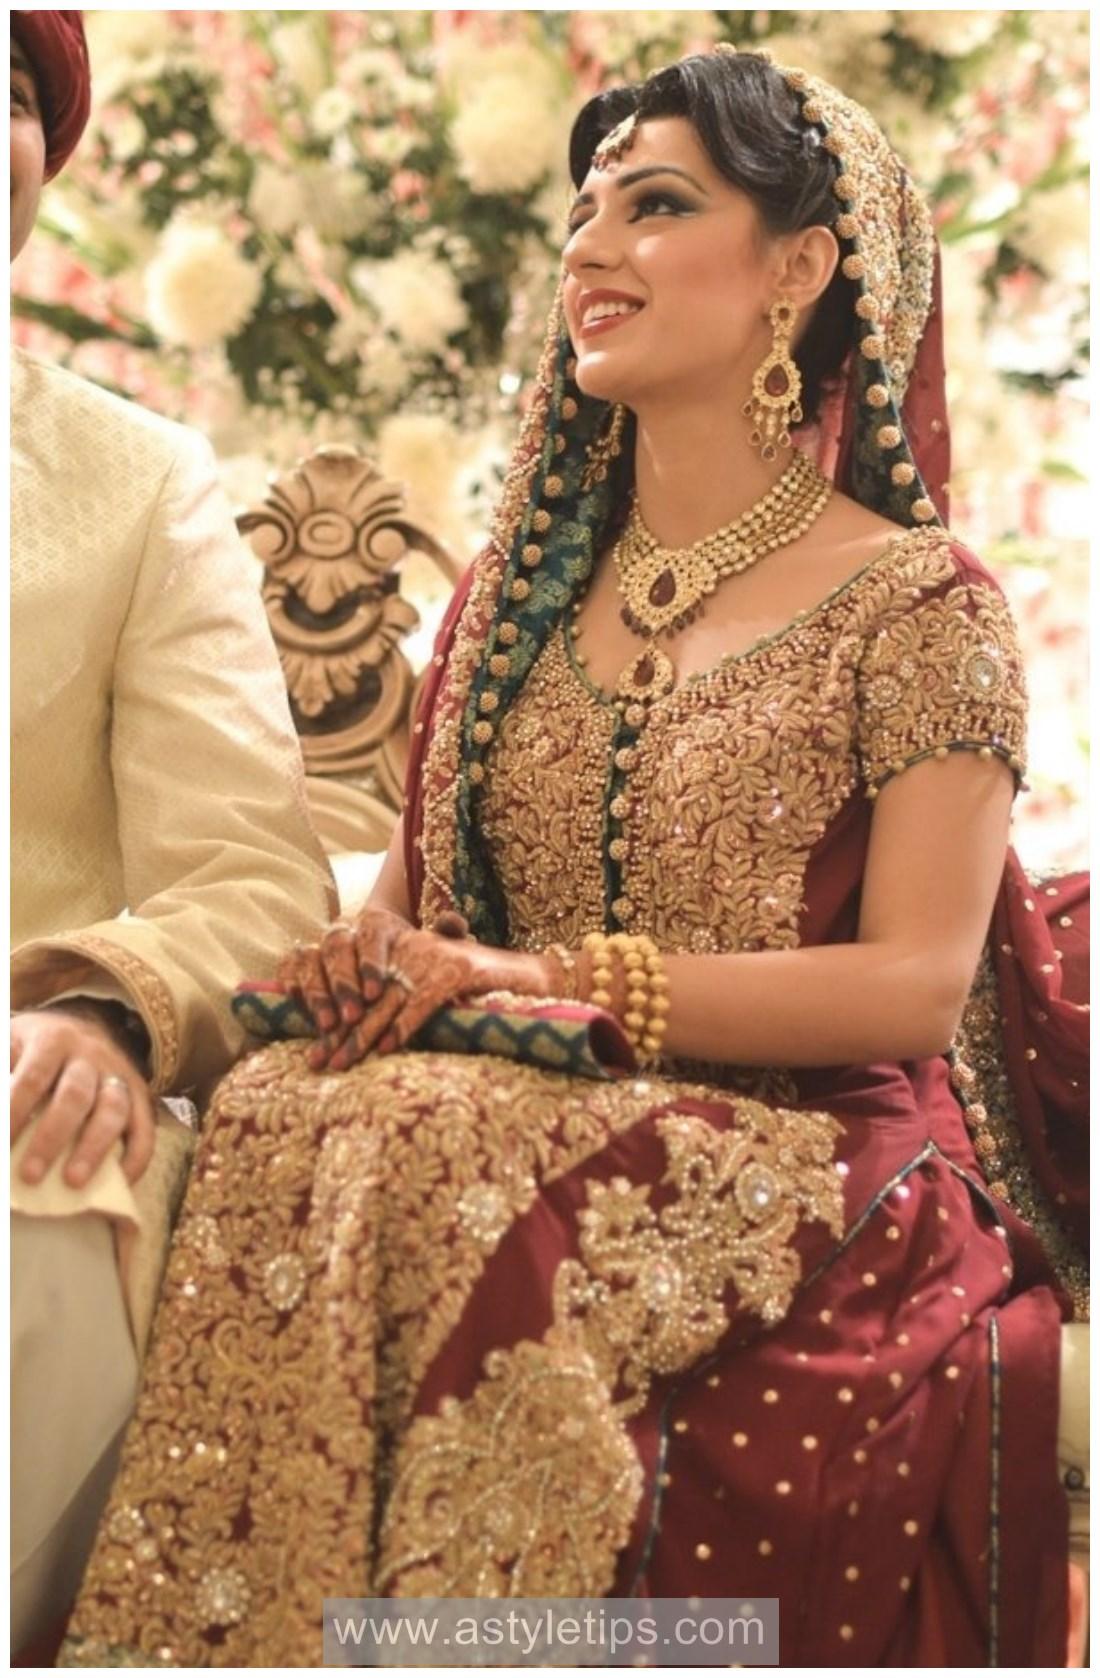 Wedding & Nikkah dresses Suits Best Designs for Ladies | A style tips